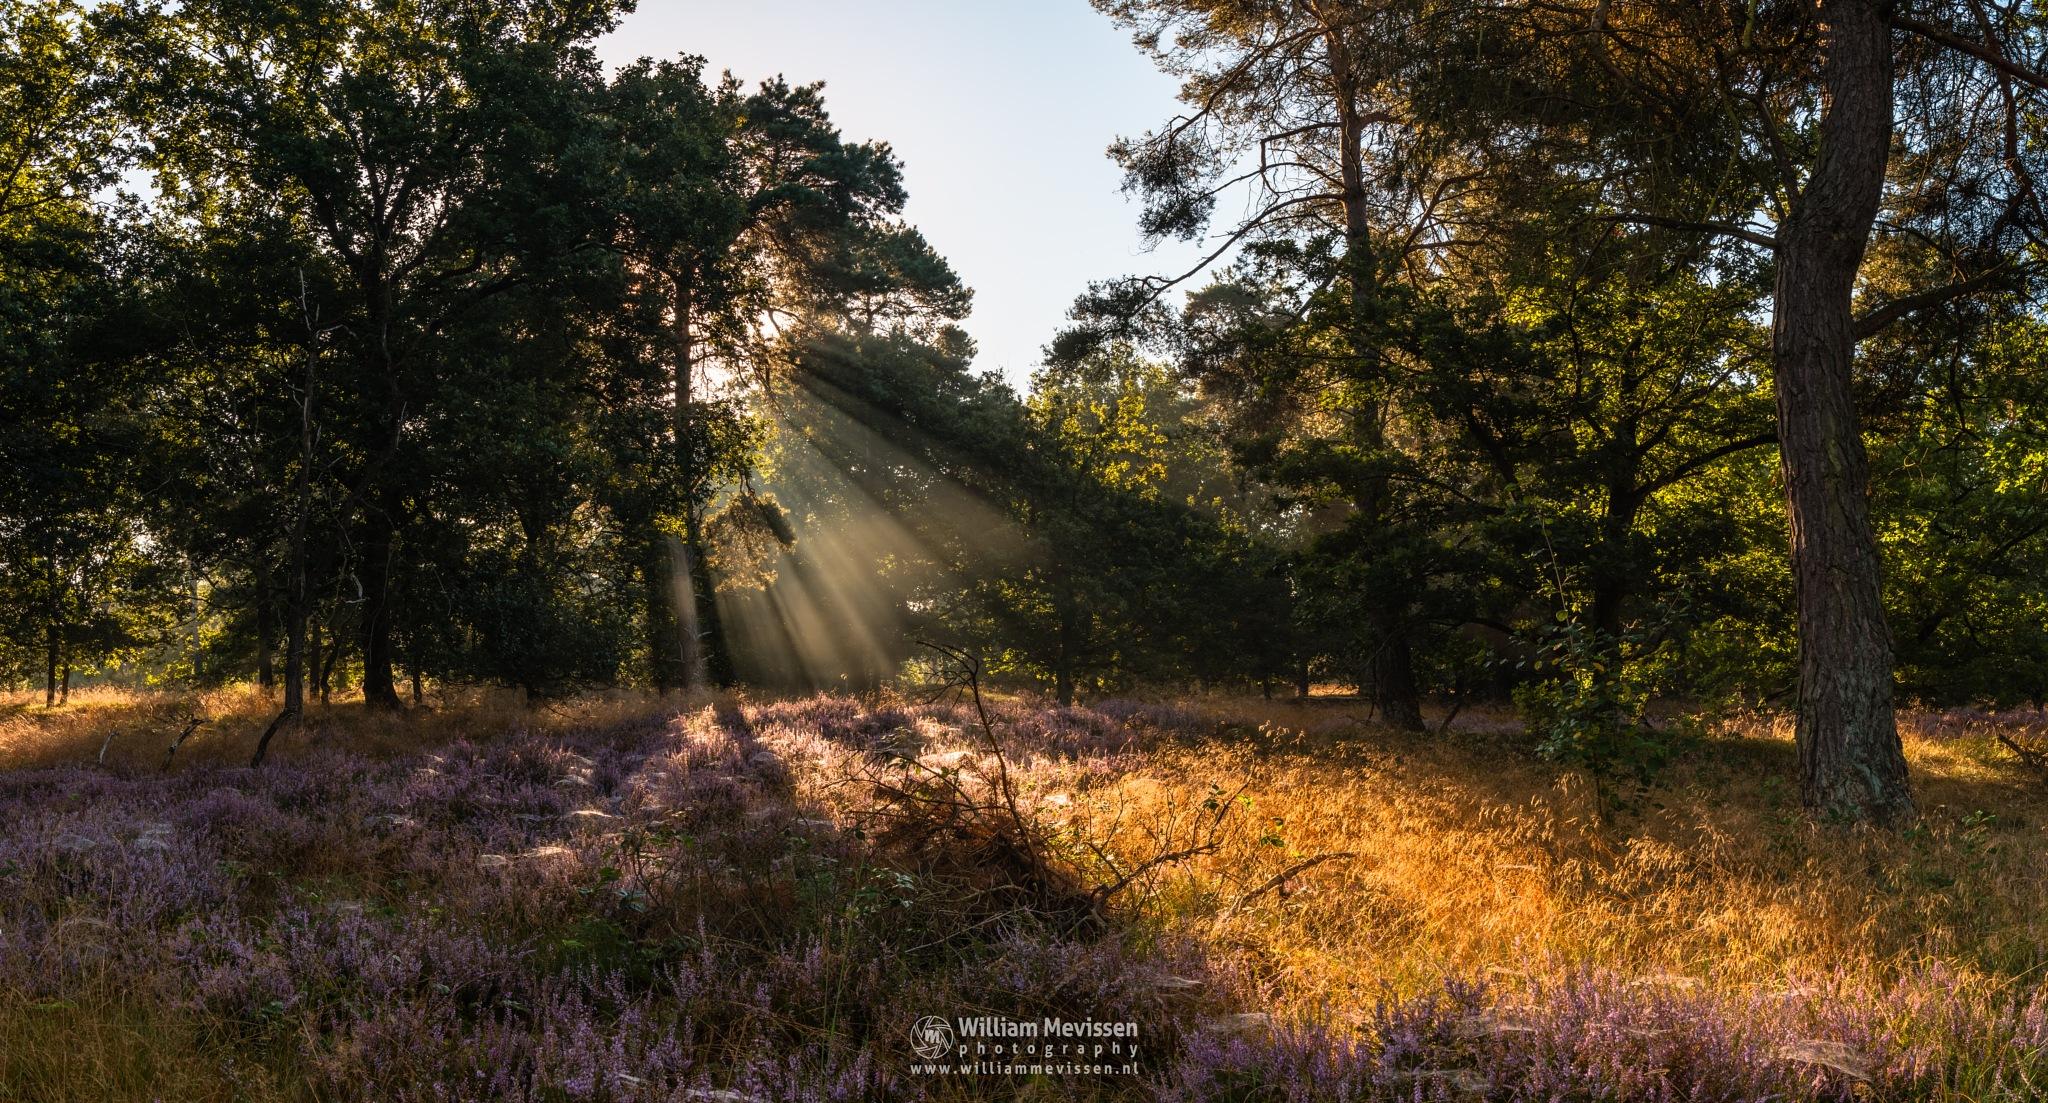 Panorama - Heather Light Rays by William Mevissen